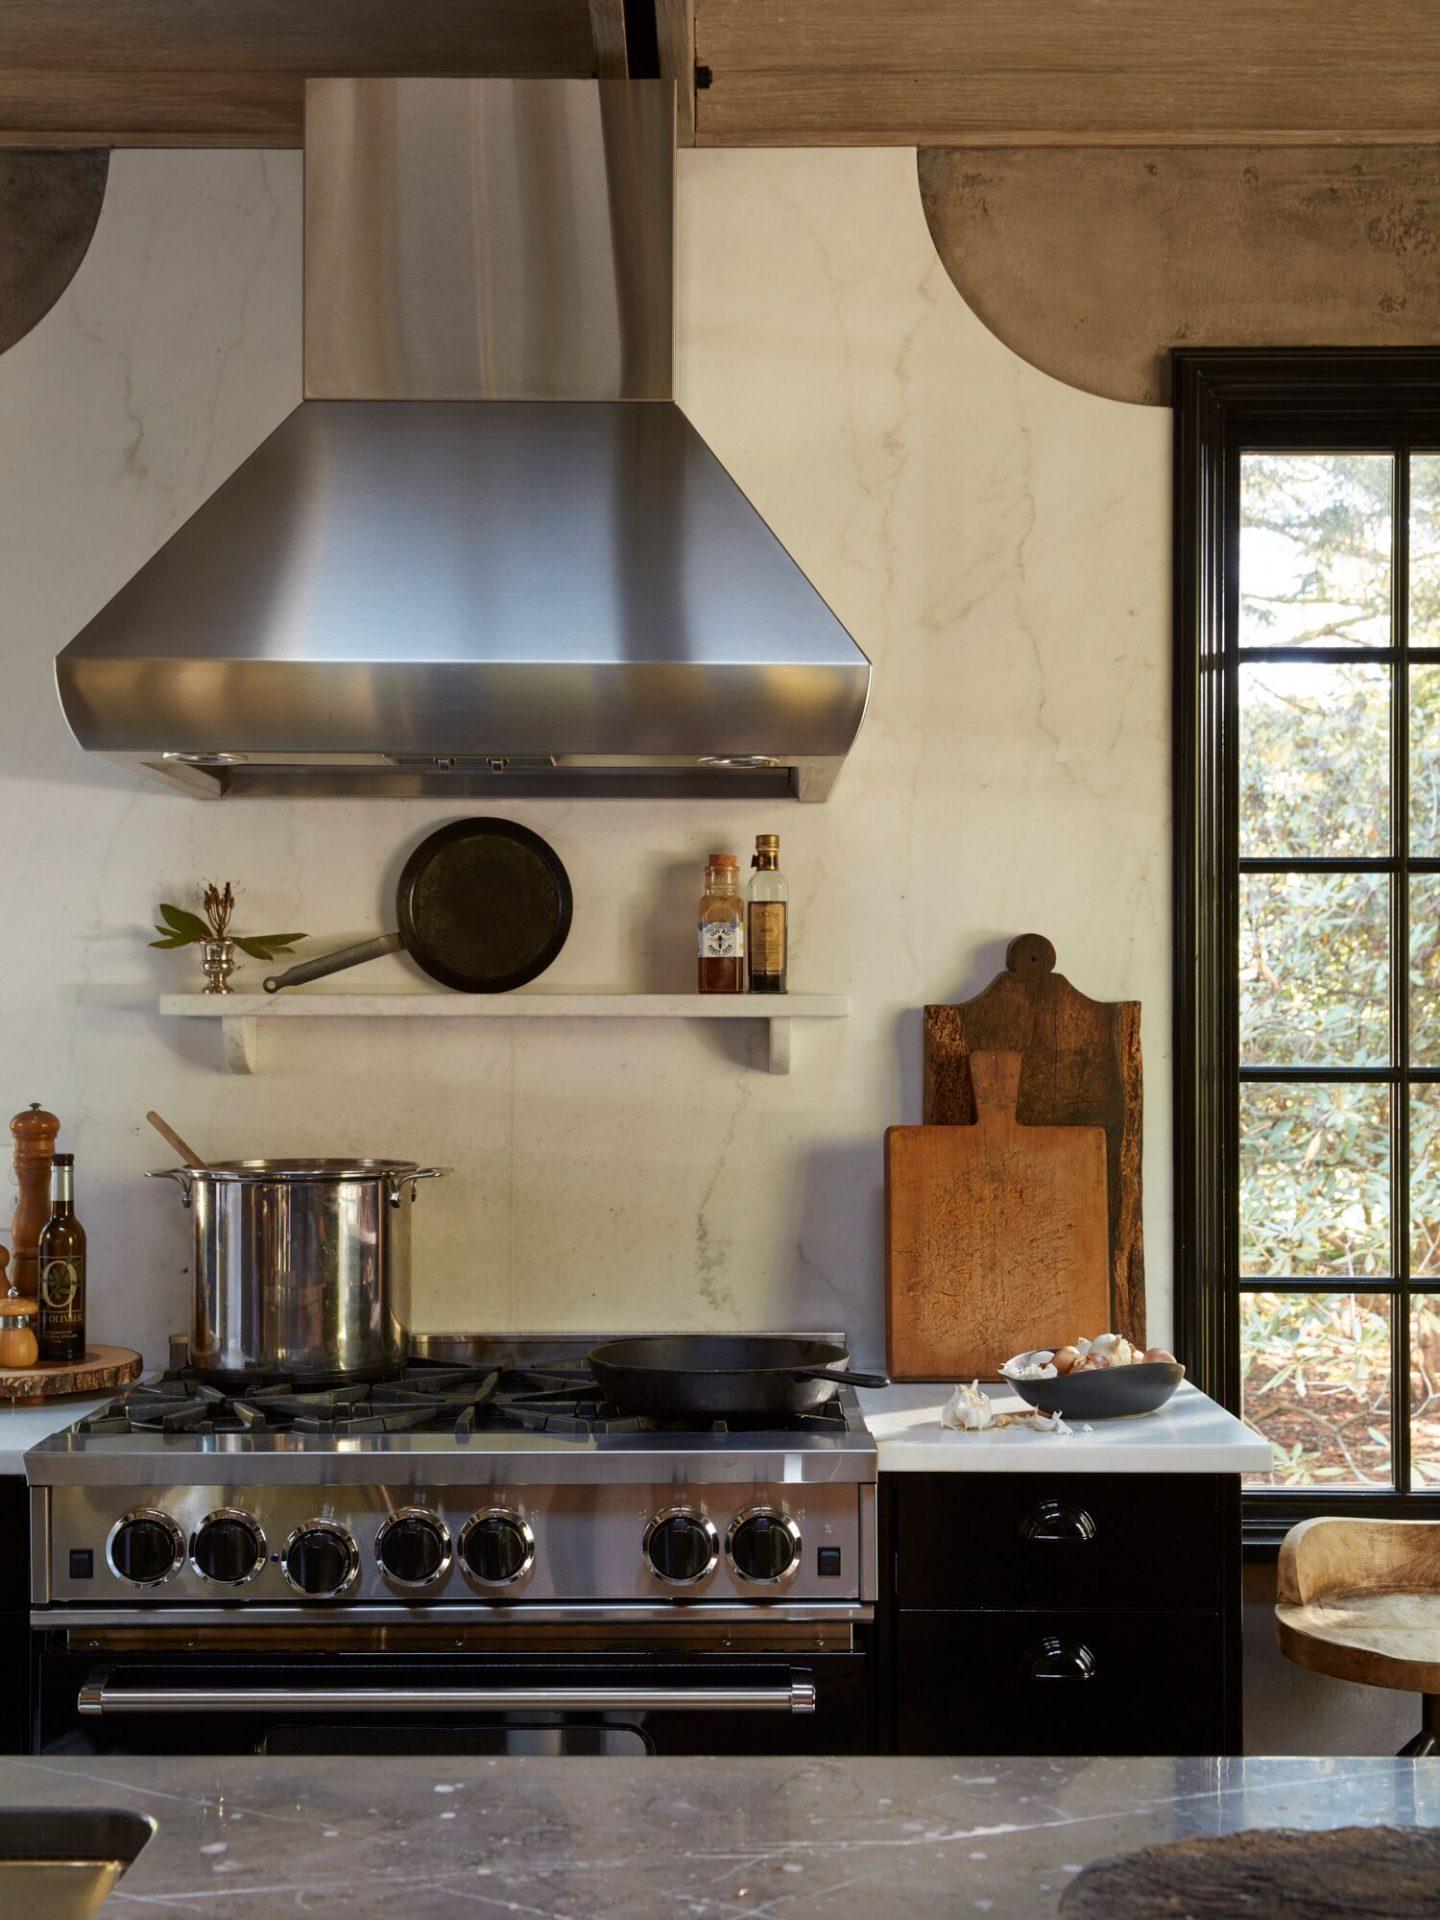 Luxury kitchen. Classic and timeless interior design by Patrick Sutton. #patricksutton #interiordesign #luxury #timelessdesign